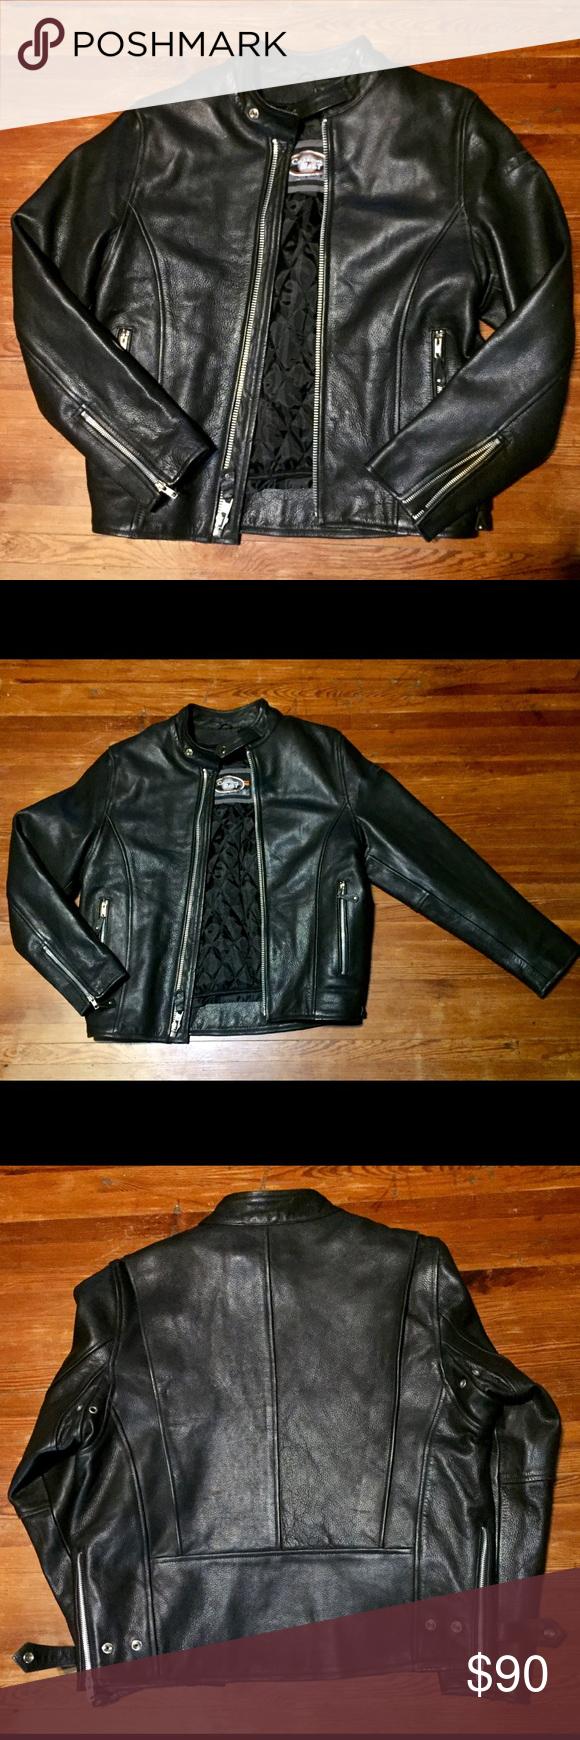 CUSTOM BILT Ladies Motorcycle Jacket CUSTOM BILT Ladies